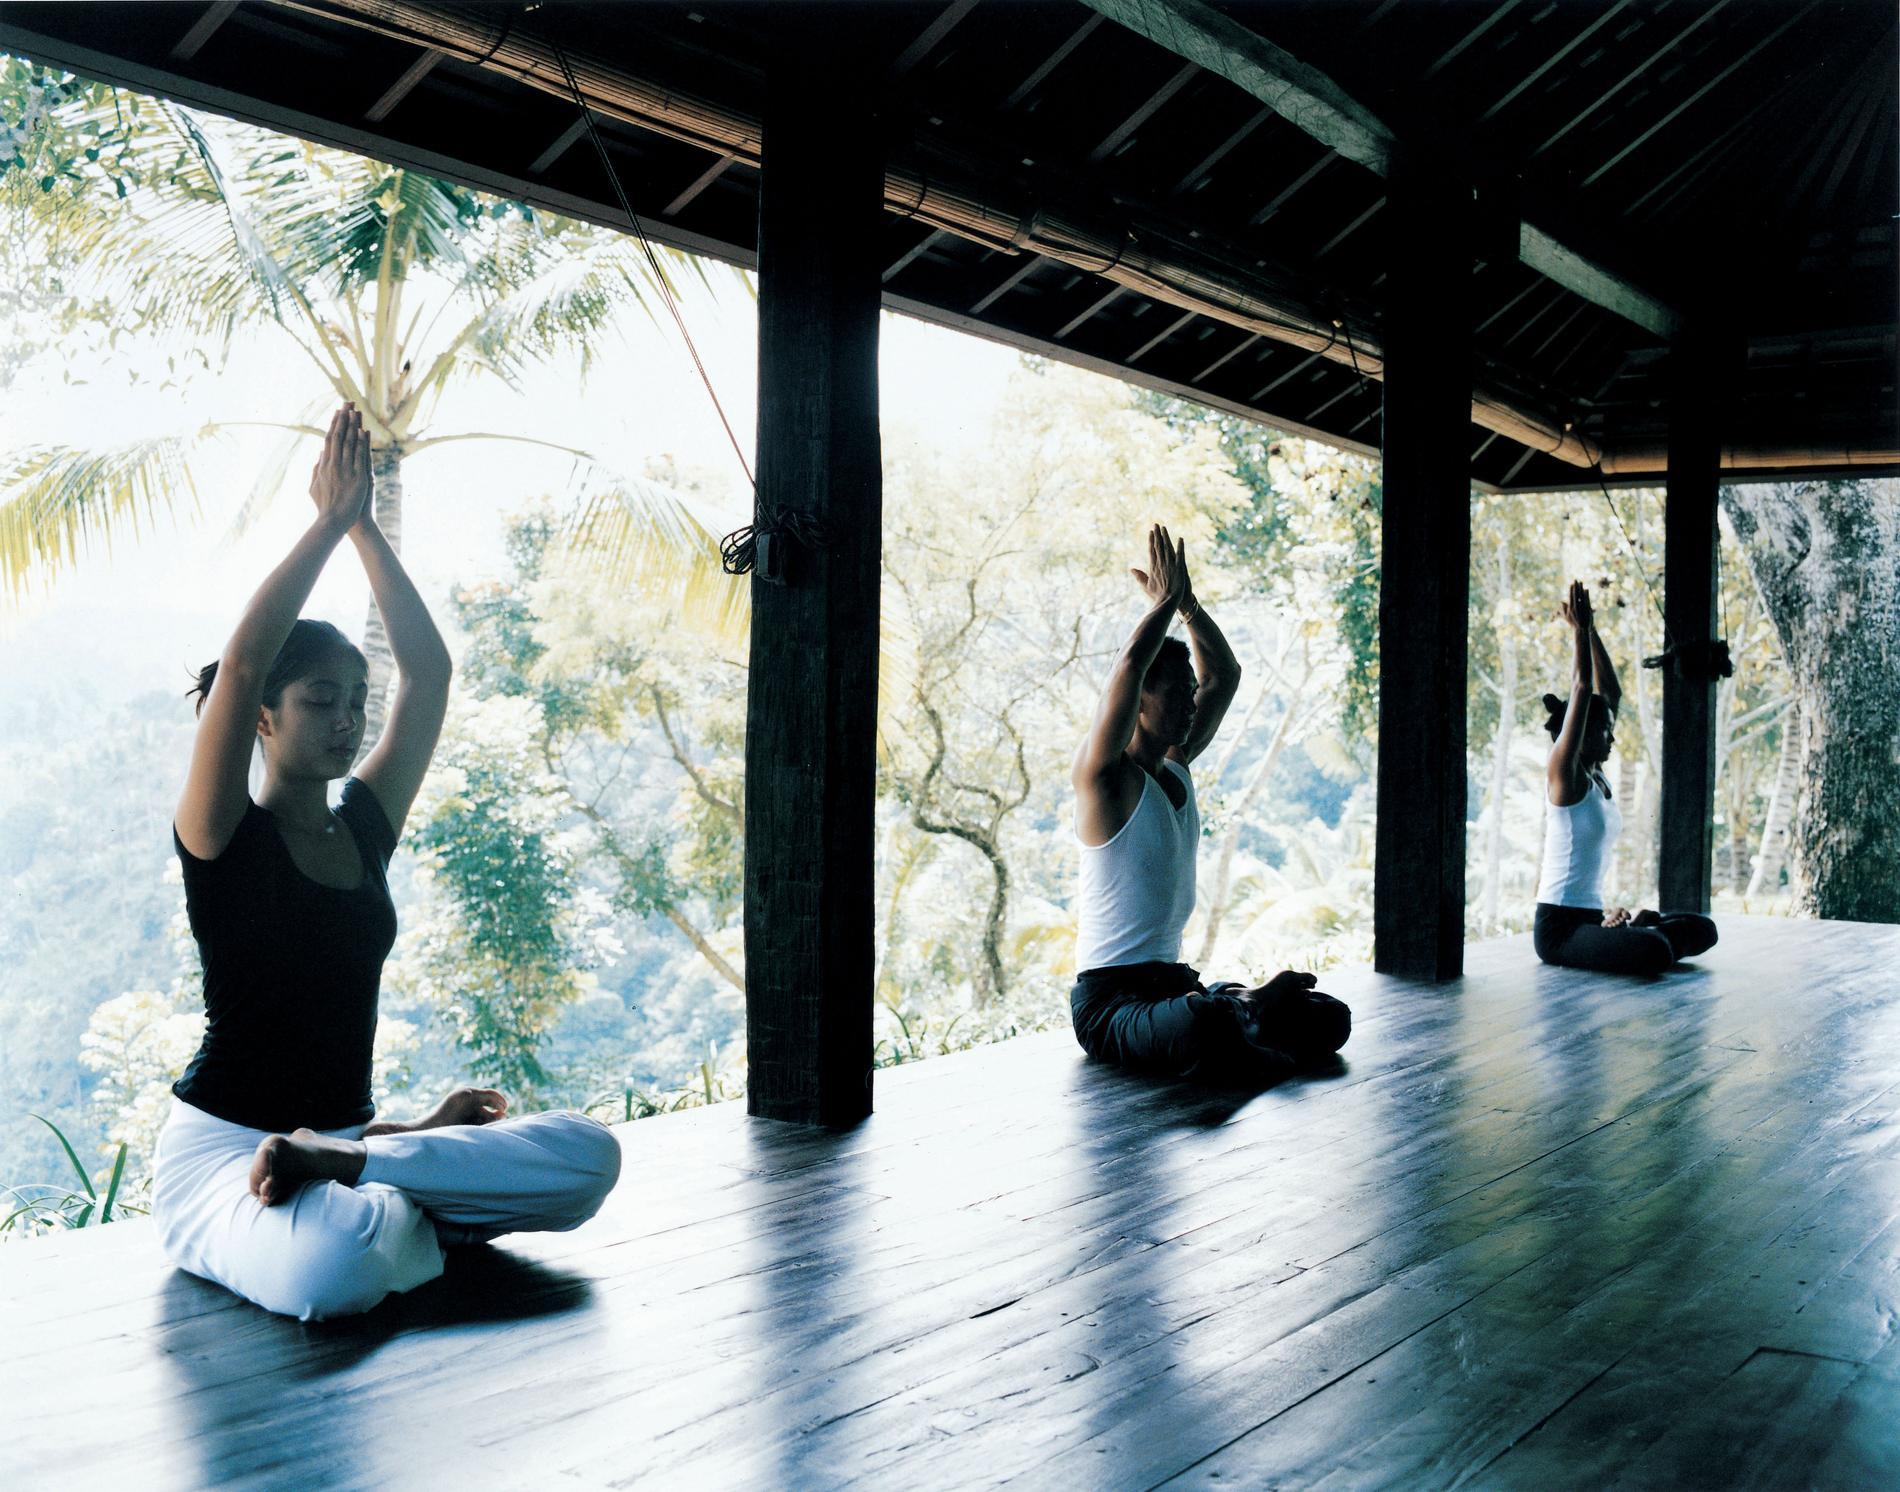 Meditation Yoga Relaxation Neuf Experiences Bien Etre A Faire A